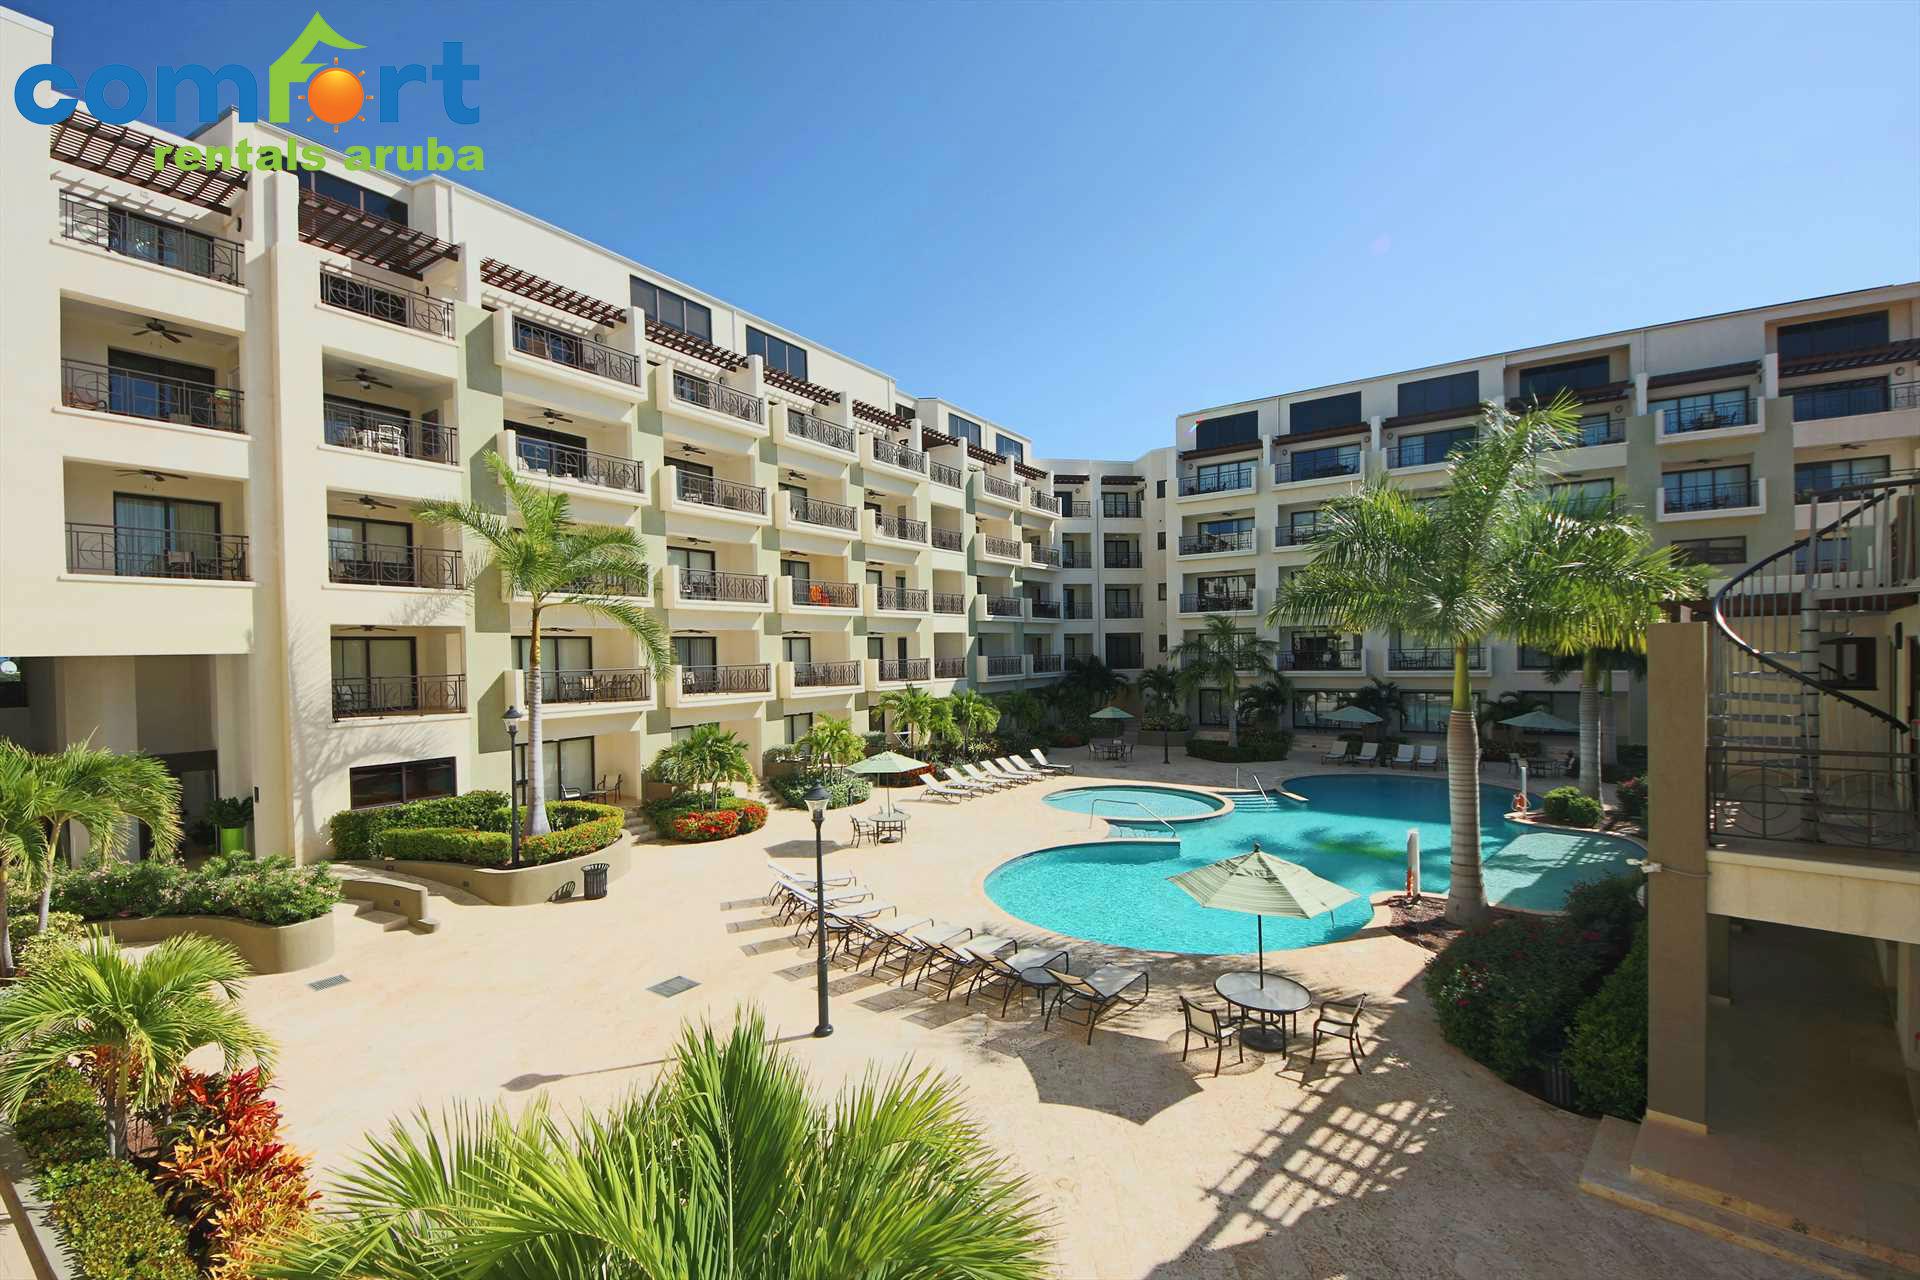 Your amazing balcony pool view